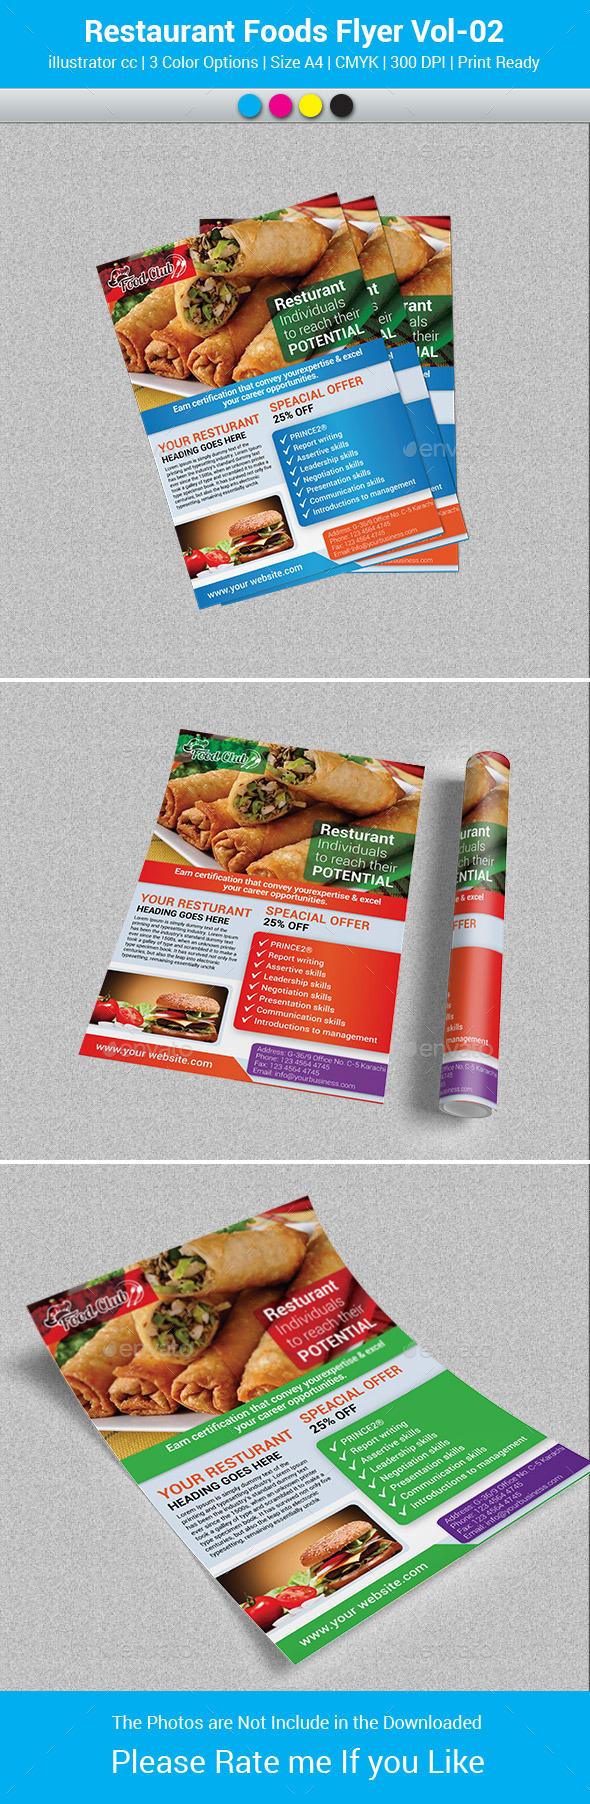 GraphicRiver Restaurant Foods Flyer Vol-02 9599799